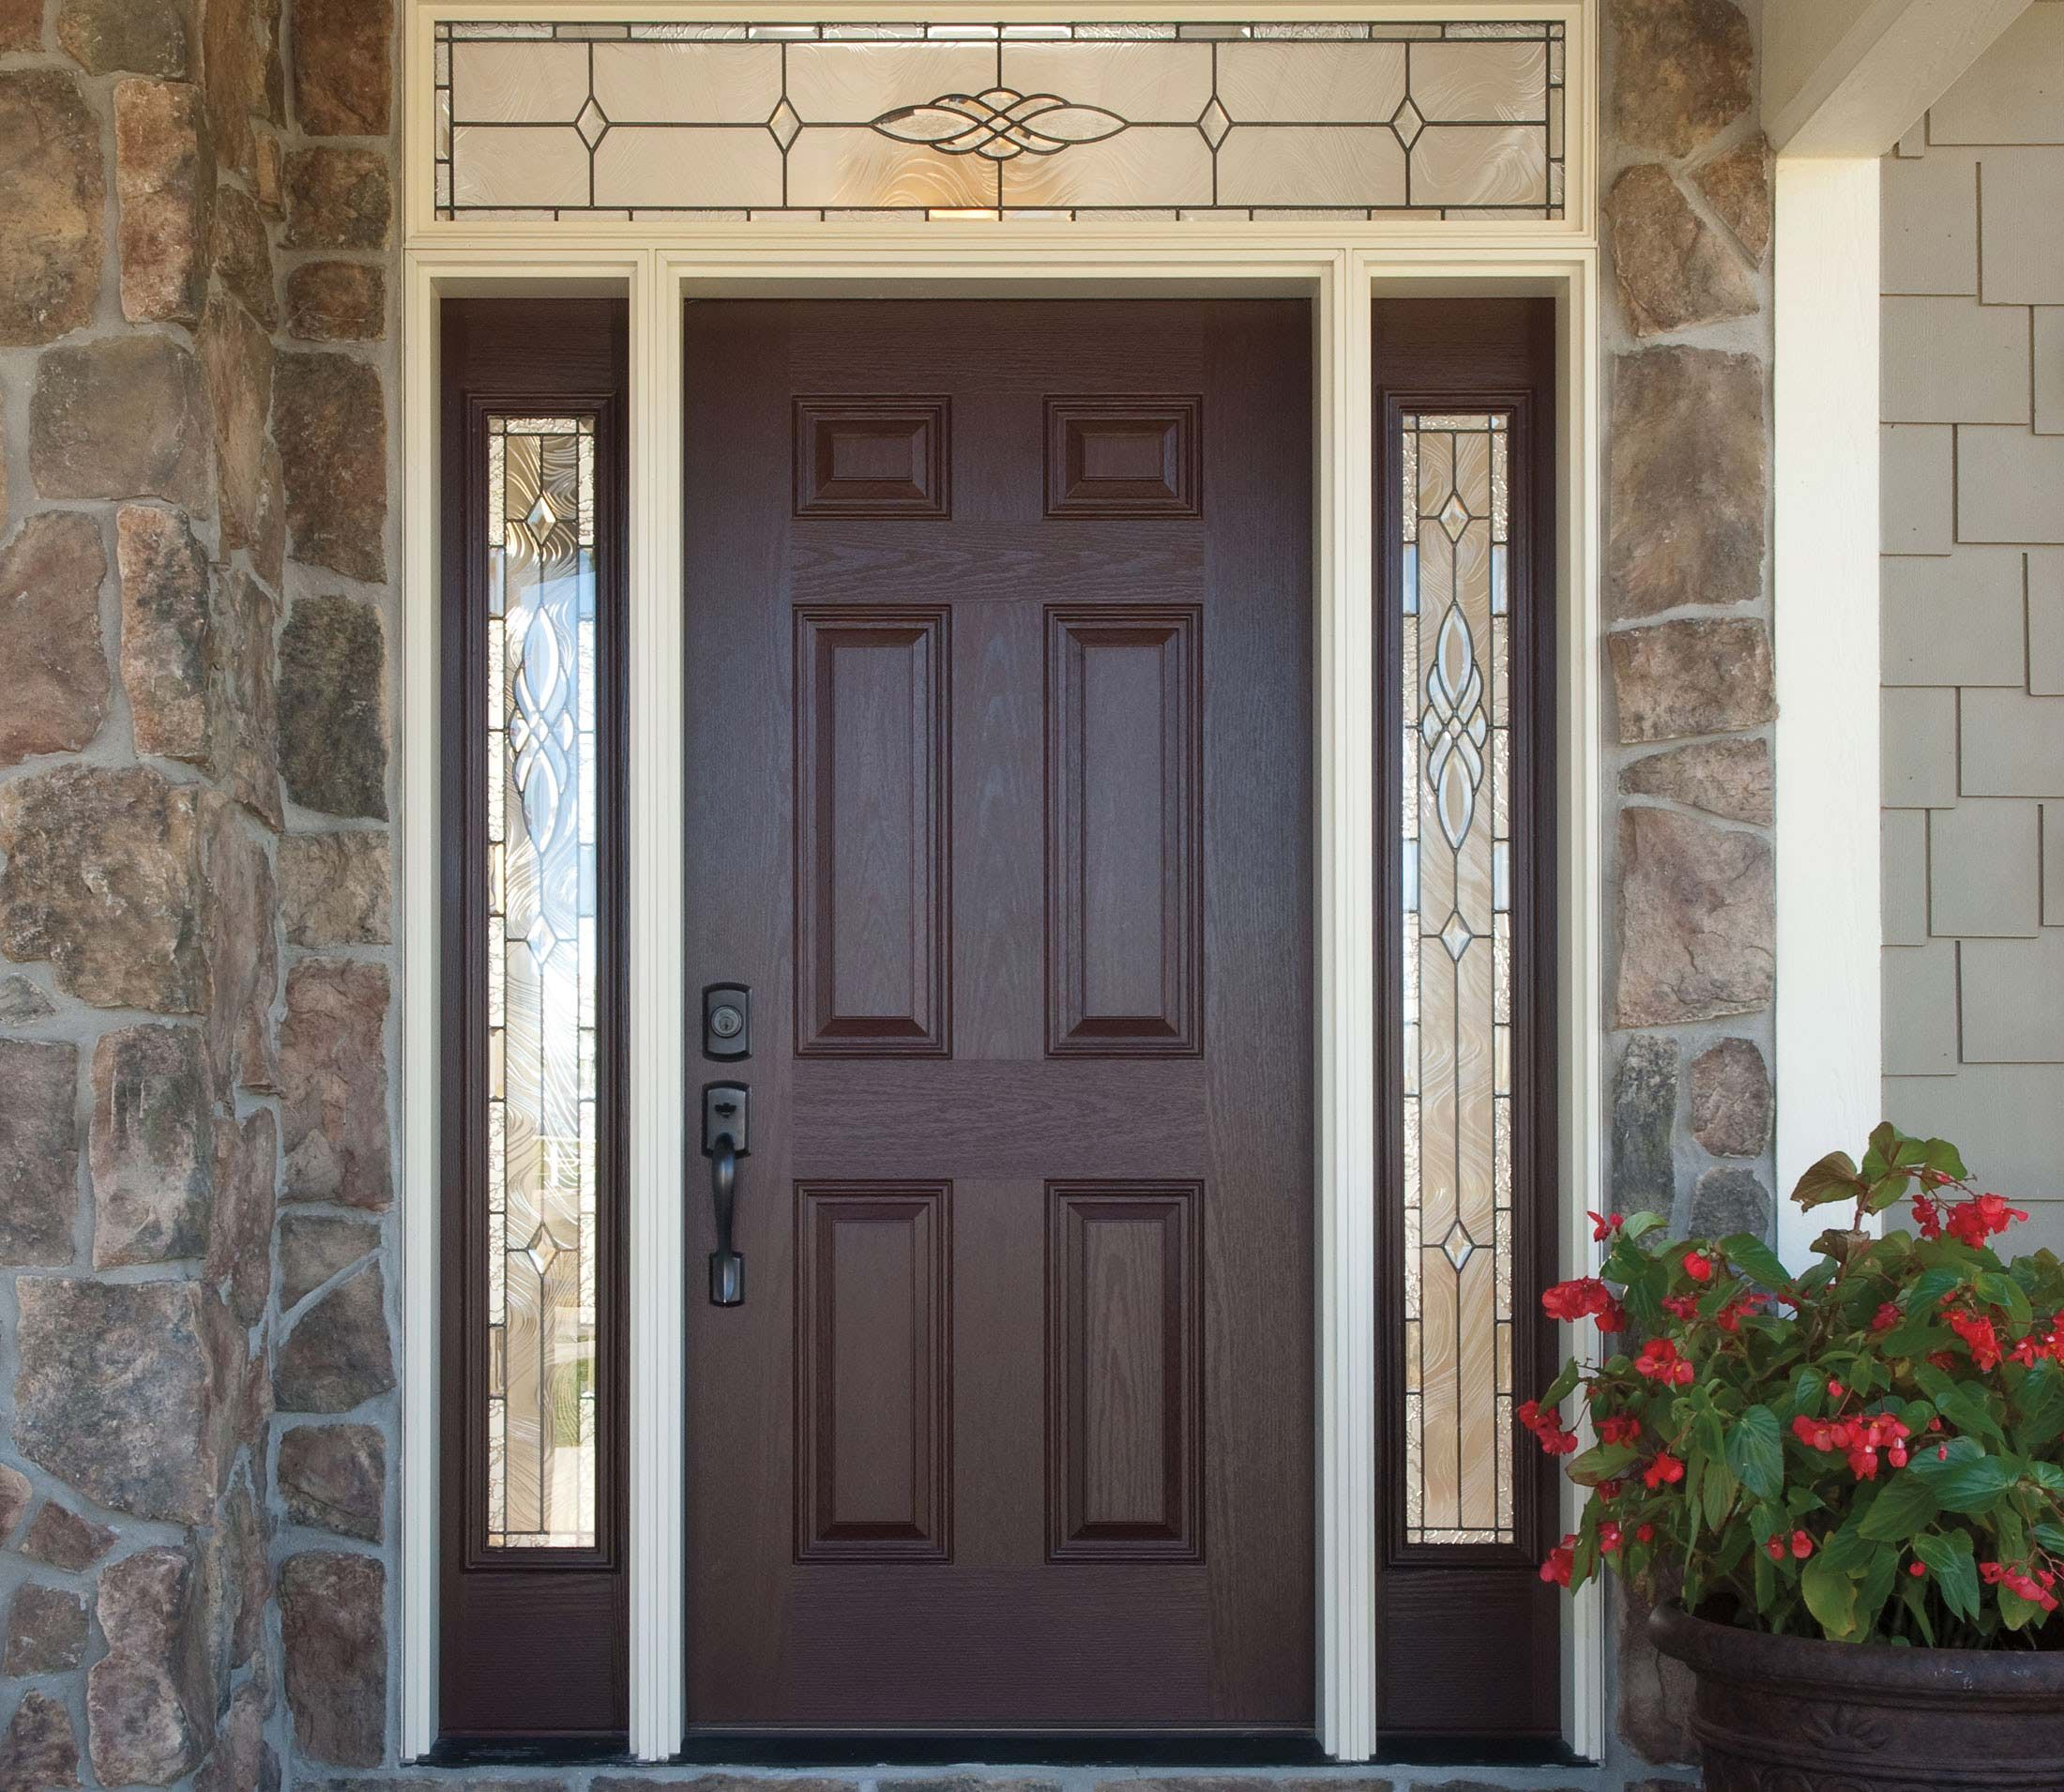 Emejing double door exterior gallery mercier portes et for Porte et fenetre laflamme